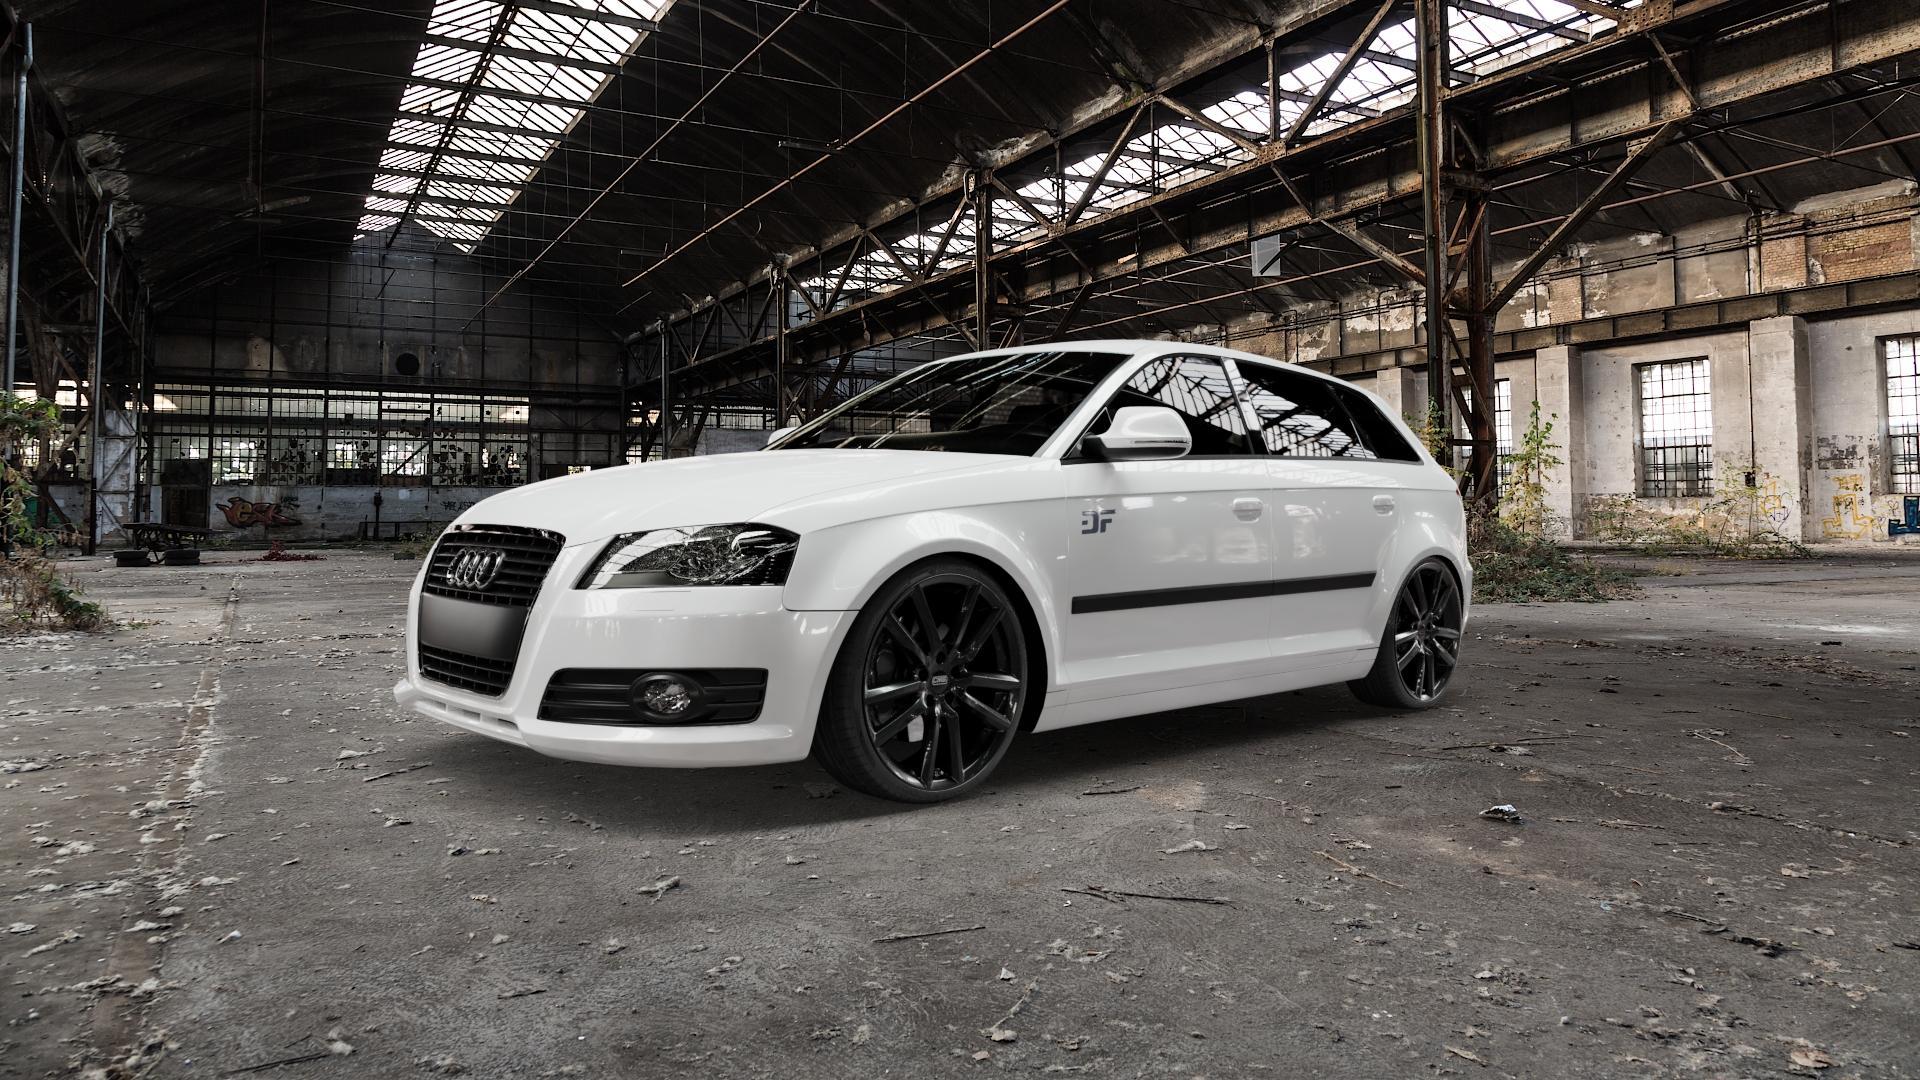 CMS C27 Complete Black Gloss Felge mit Reifen schwarz in 19Zoll Winterfelge Alufelge auf weissem Audi A3 Typ 8P (Sportback) 1,6l 75kW (102 PS) 2,0l FSI 110kW (150 1,9l TDI 77kW (105 103kW (140 TFSI 147kW (200 85kW (116 100kW (136 1,8l 118kW (160 125kW (170 1,4l 92kW (125 120kW (163 quattro 3,2l V6 184kW (250 S3 195kW (265 1,2l 66kW (90 18